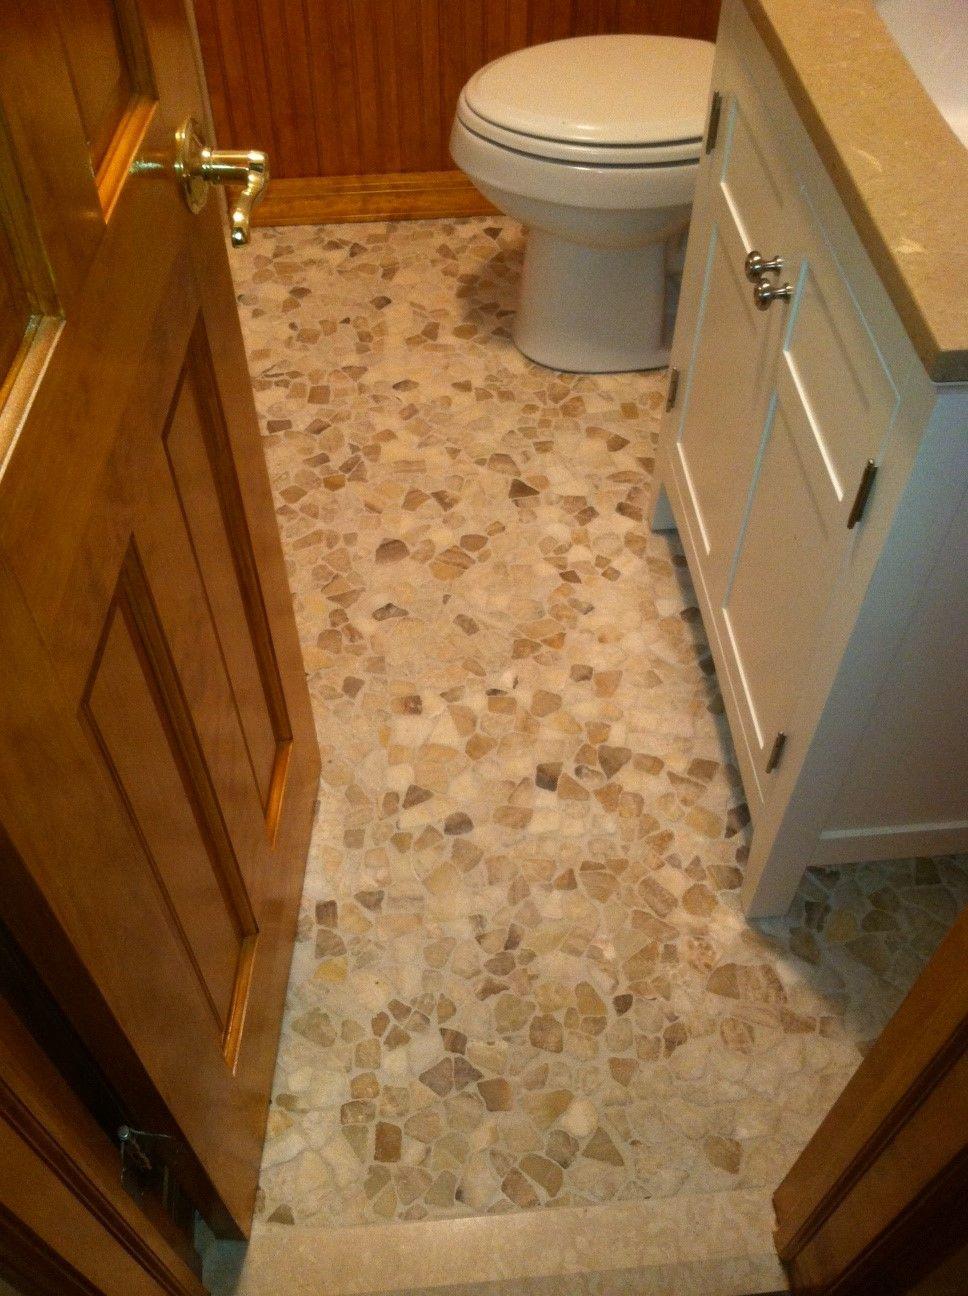 Pebble bathroom floor tiles - Pebble Bathroom Floor Dactus Pebble Floor Tiles Bathroom